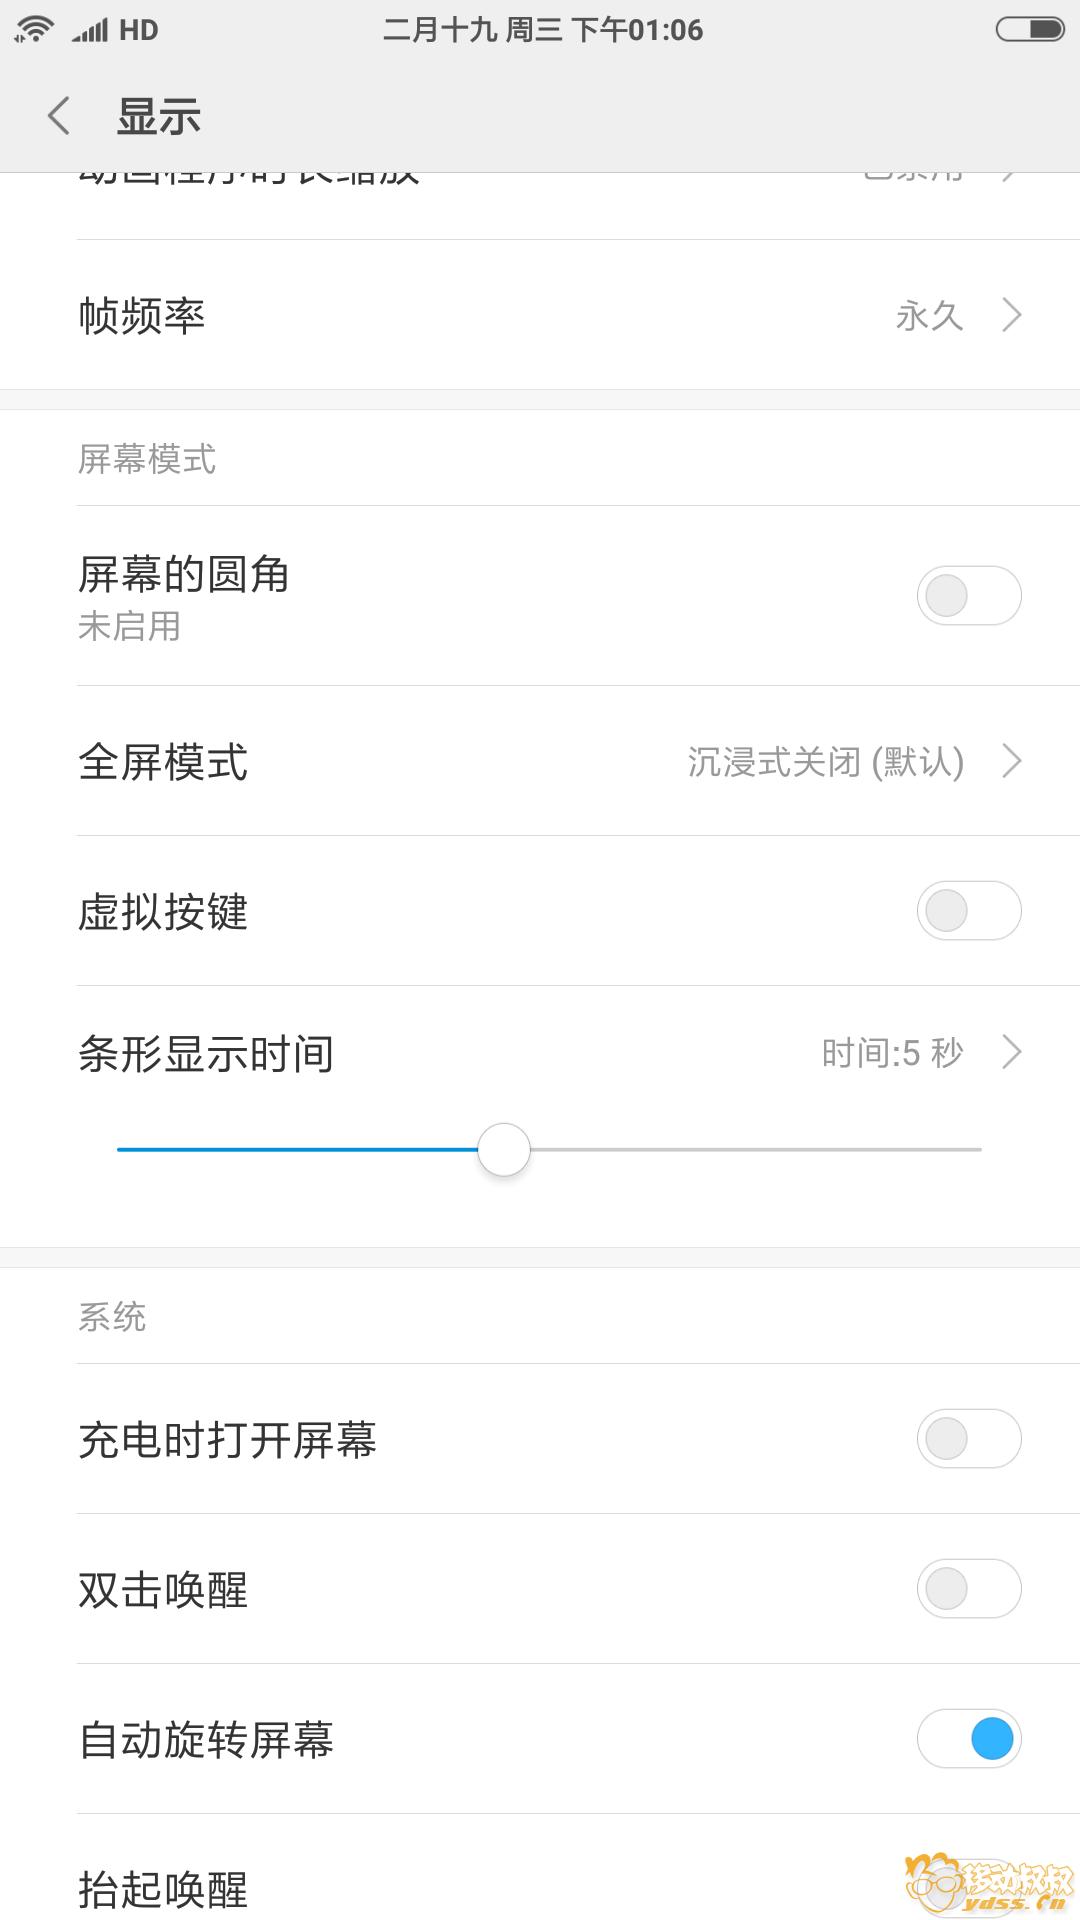 Screenshot_2018-04-04-13-06-02-553_com.android.se.png